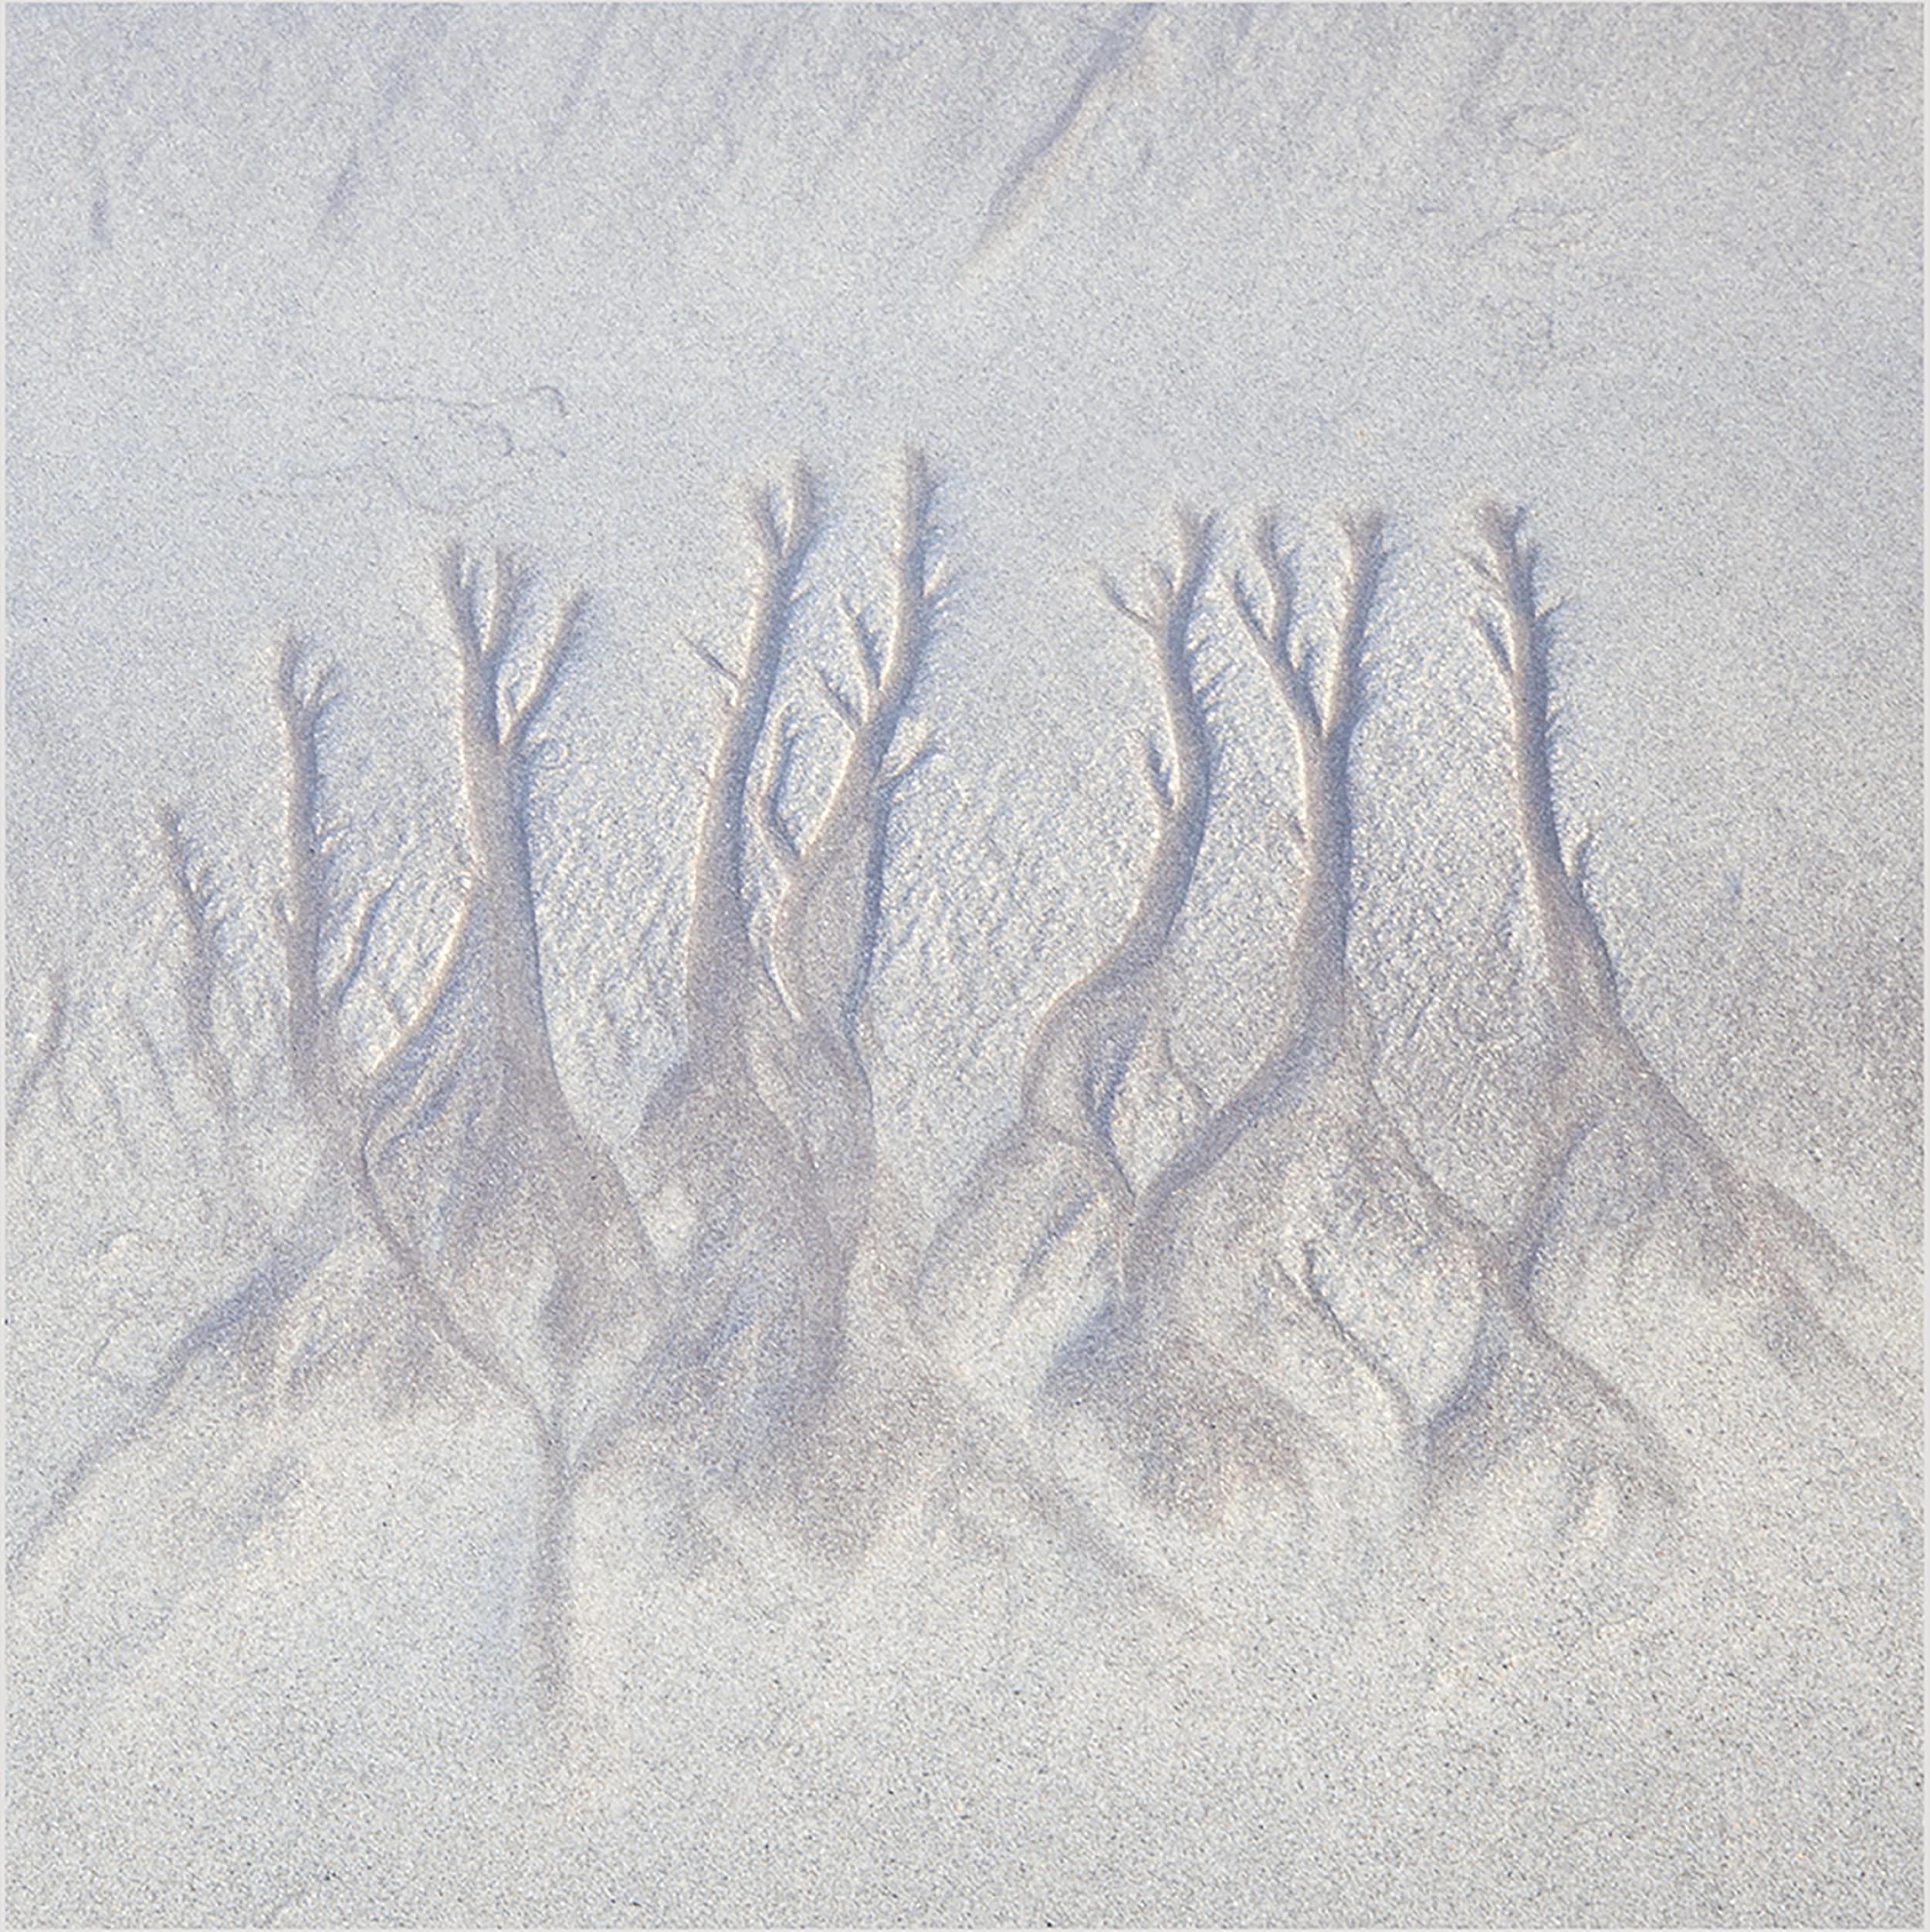 Sand Pattern 3.jpg